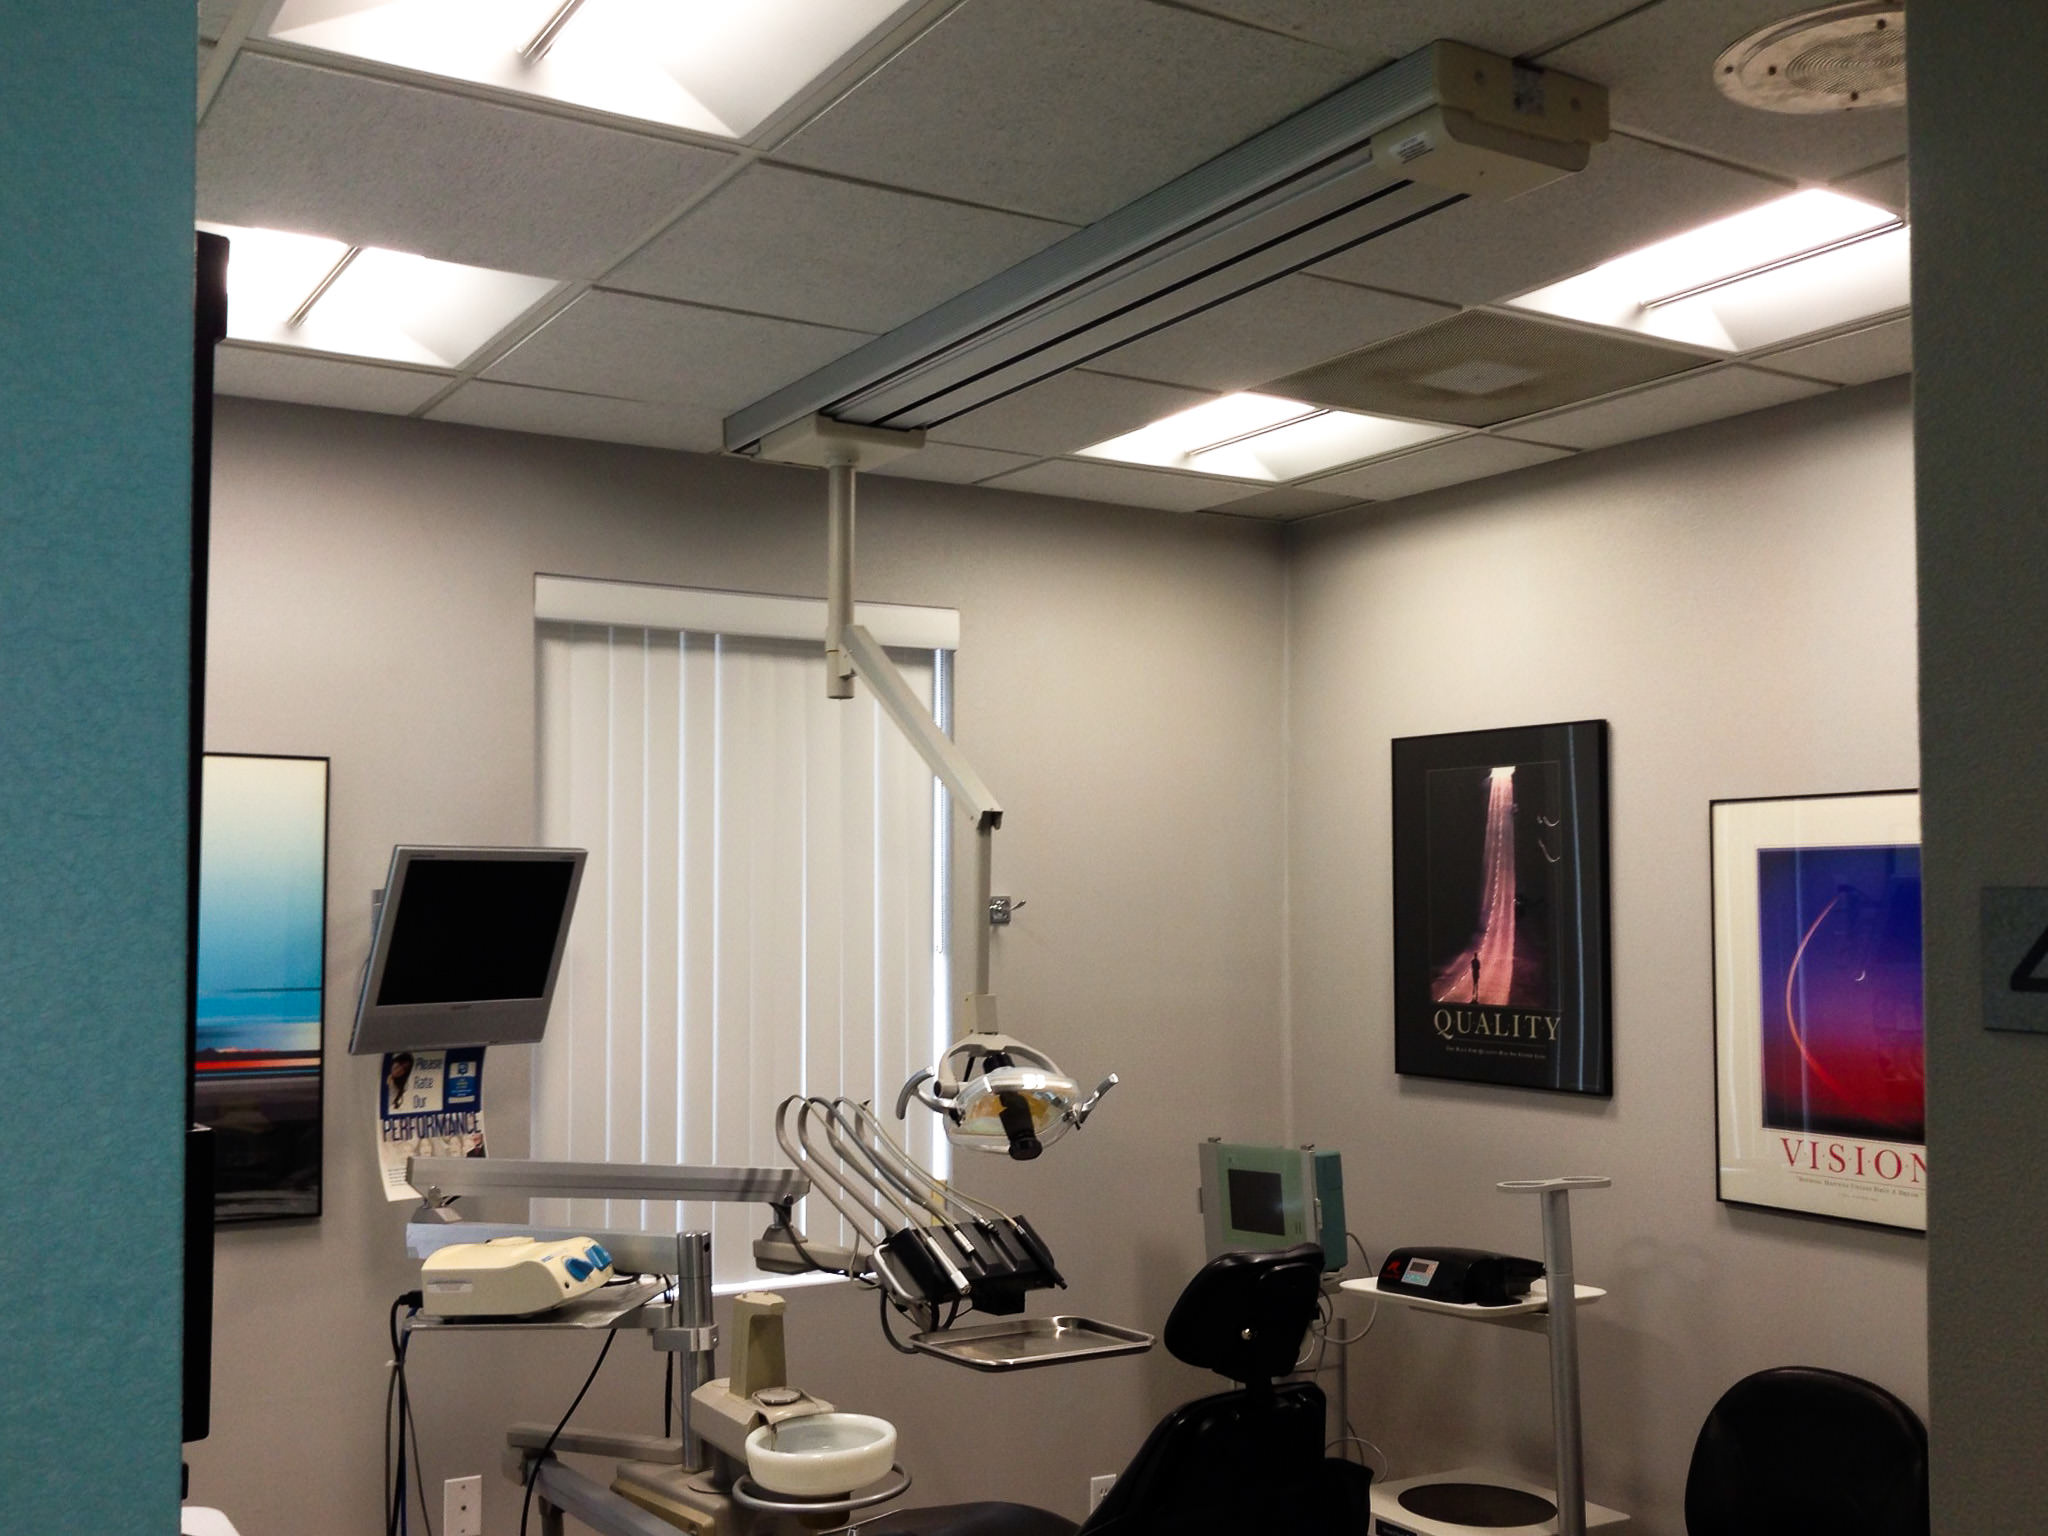 Compower Dentist Office LED Light Celing Indoor-107.jpg